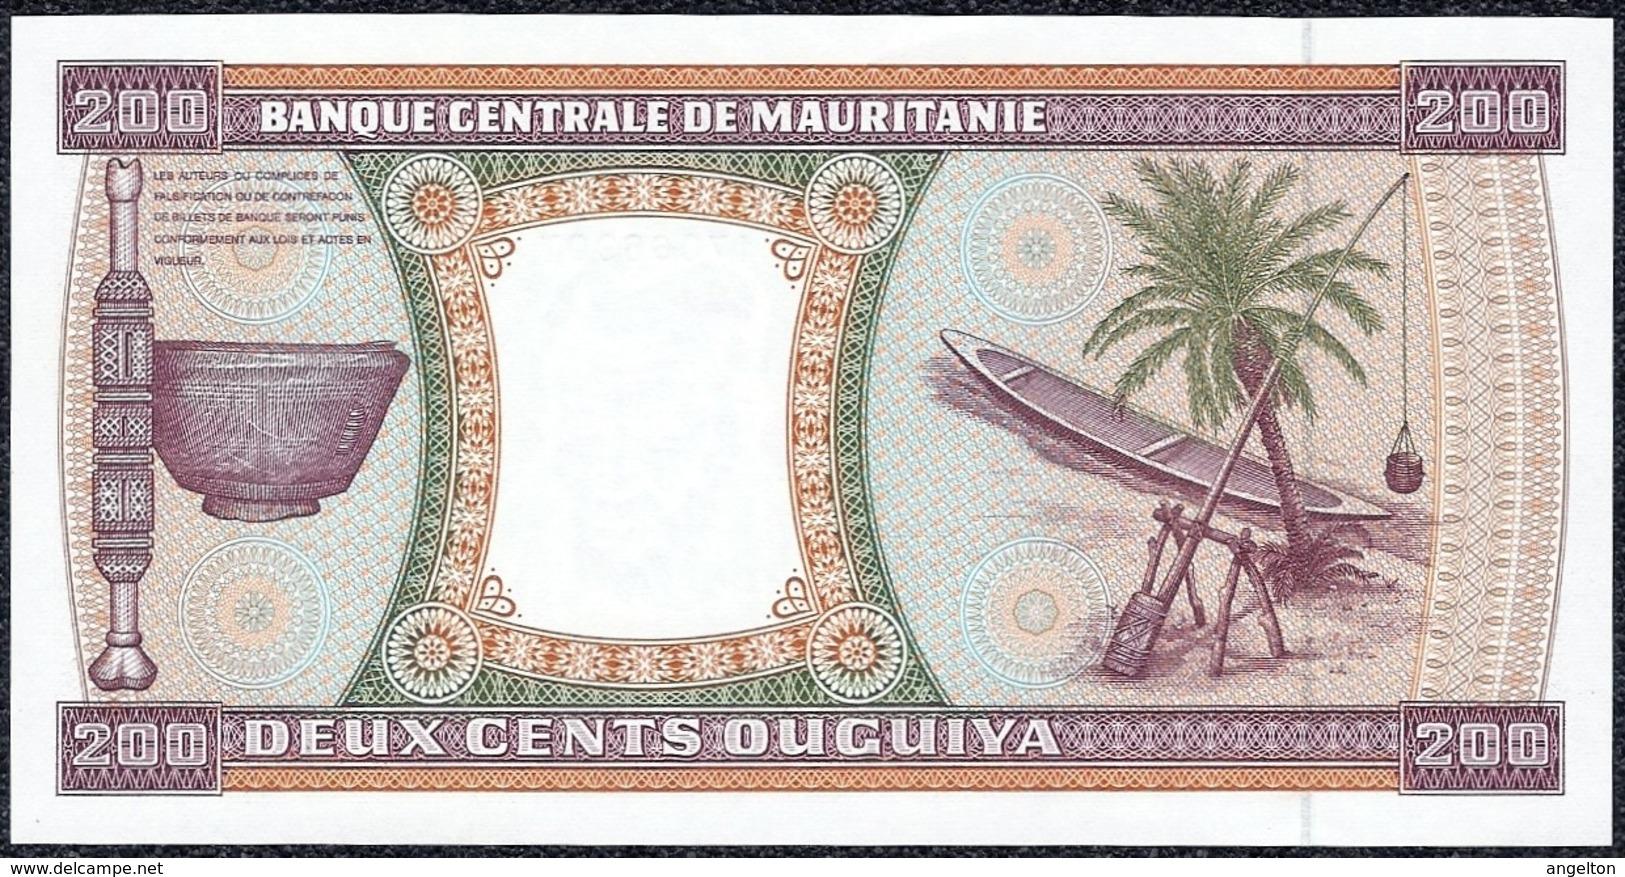 Mauritania 200 Ouguiya 1989 *UNC* Banknote - Mauritania